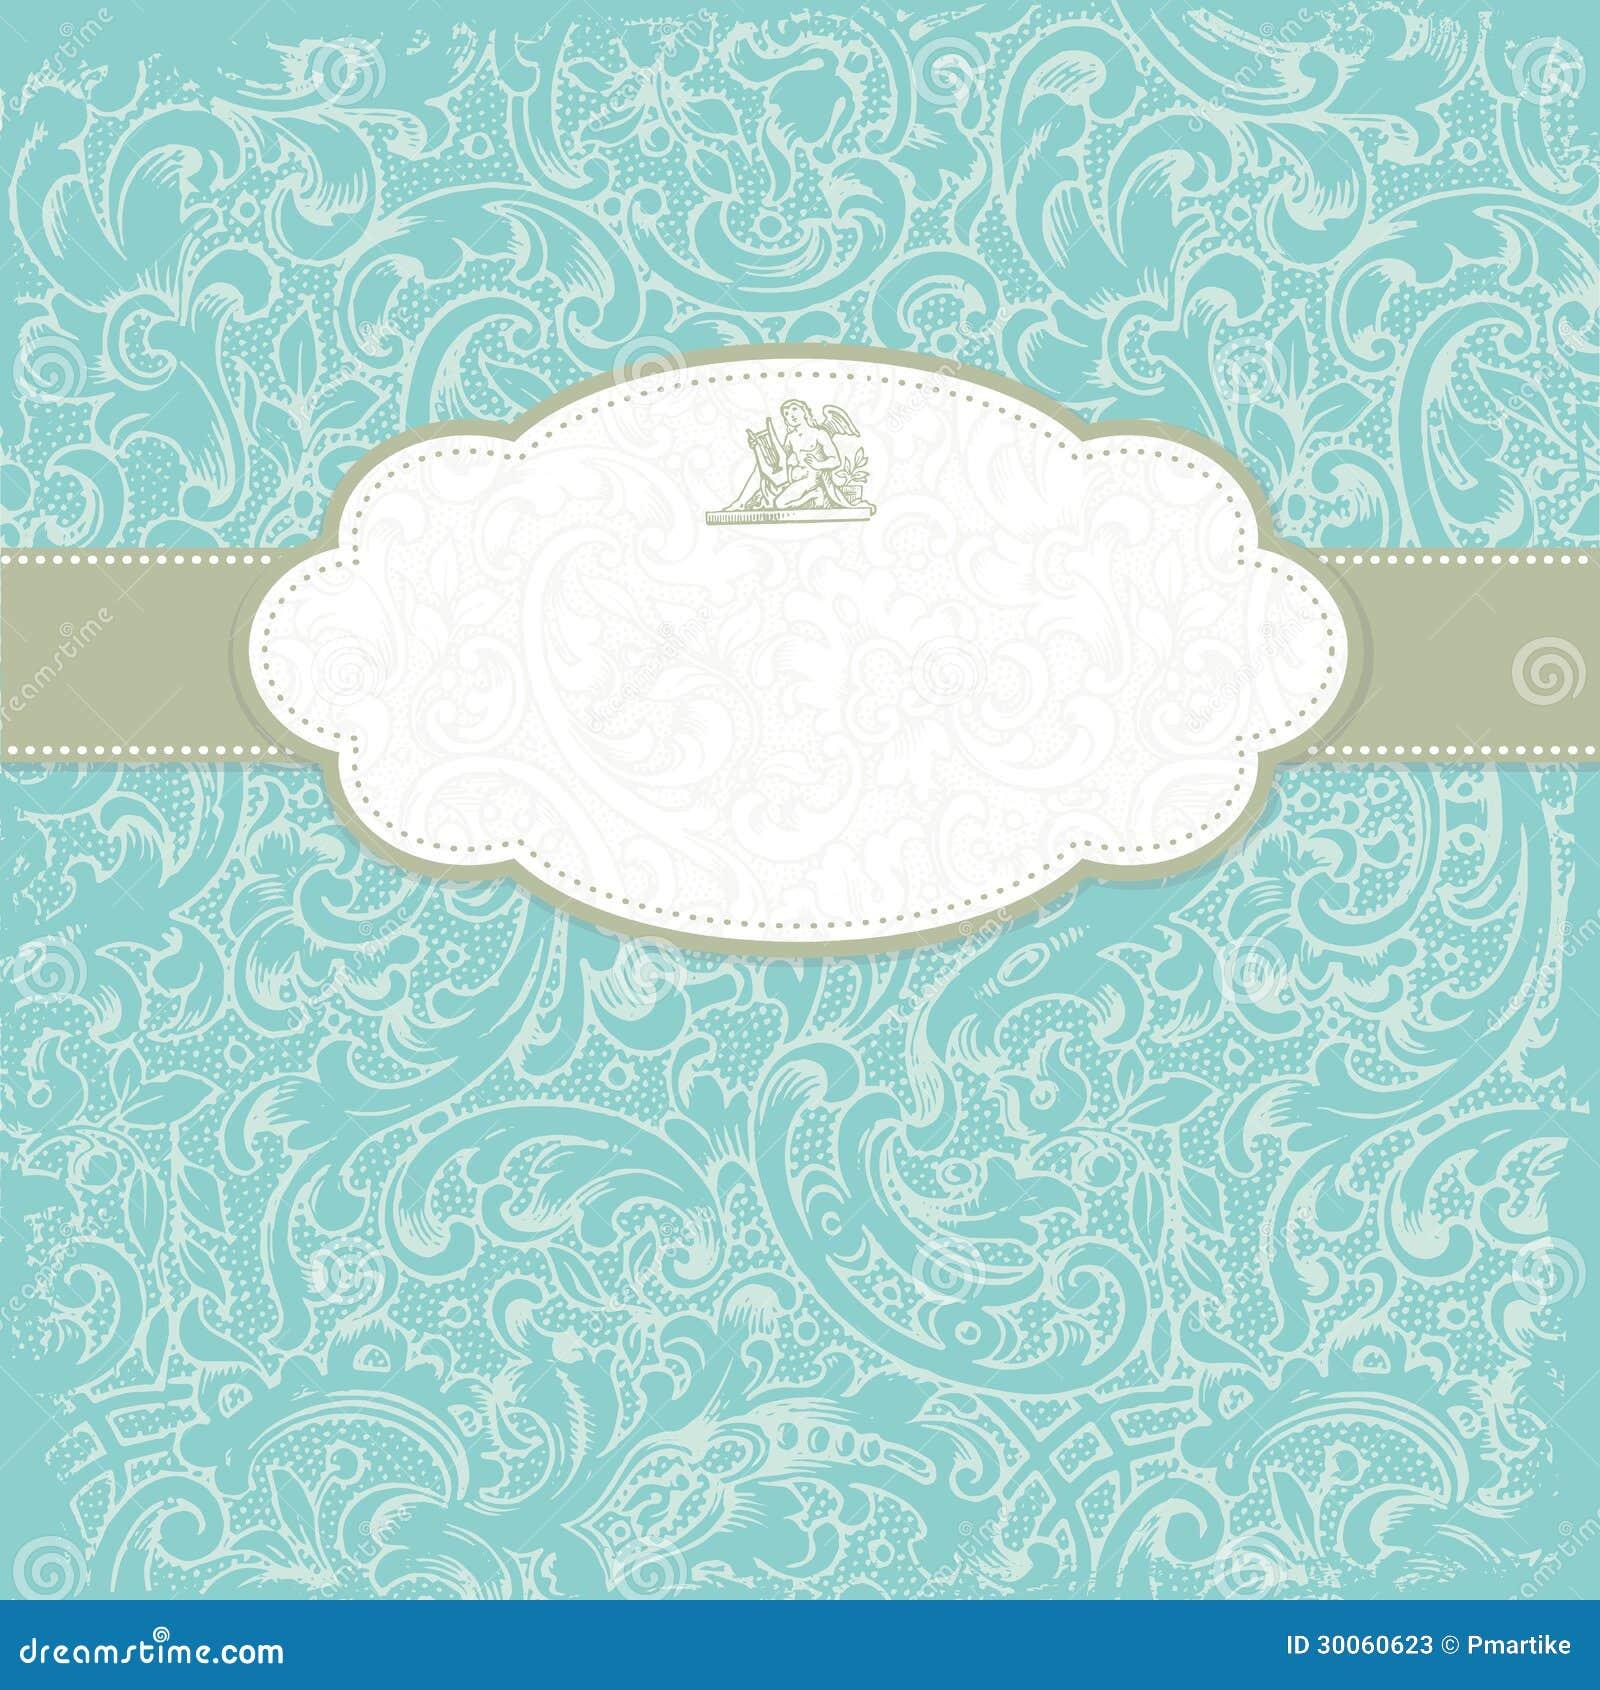 Wedding Celebration Invitations for awesome invitations layout